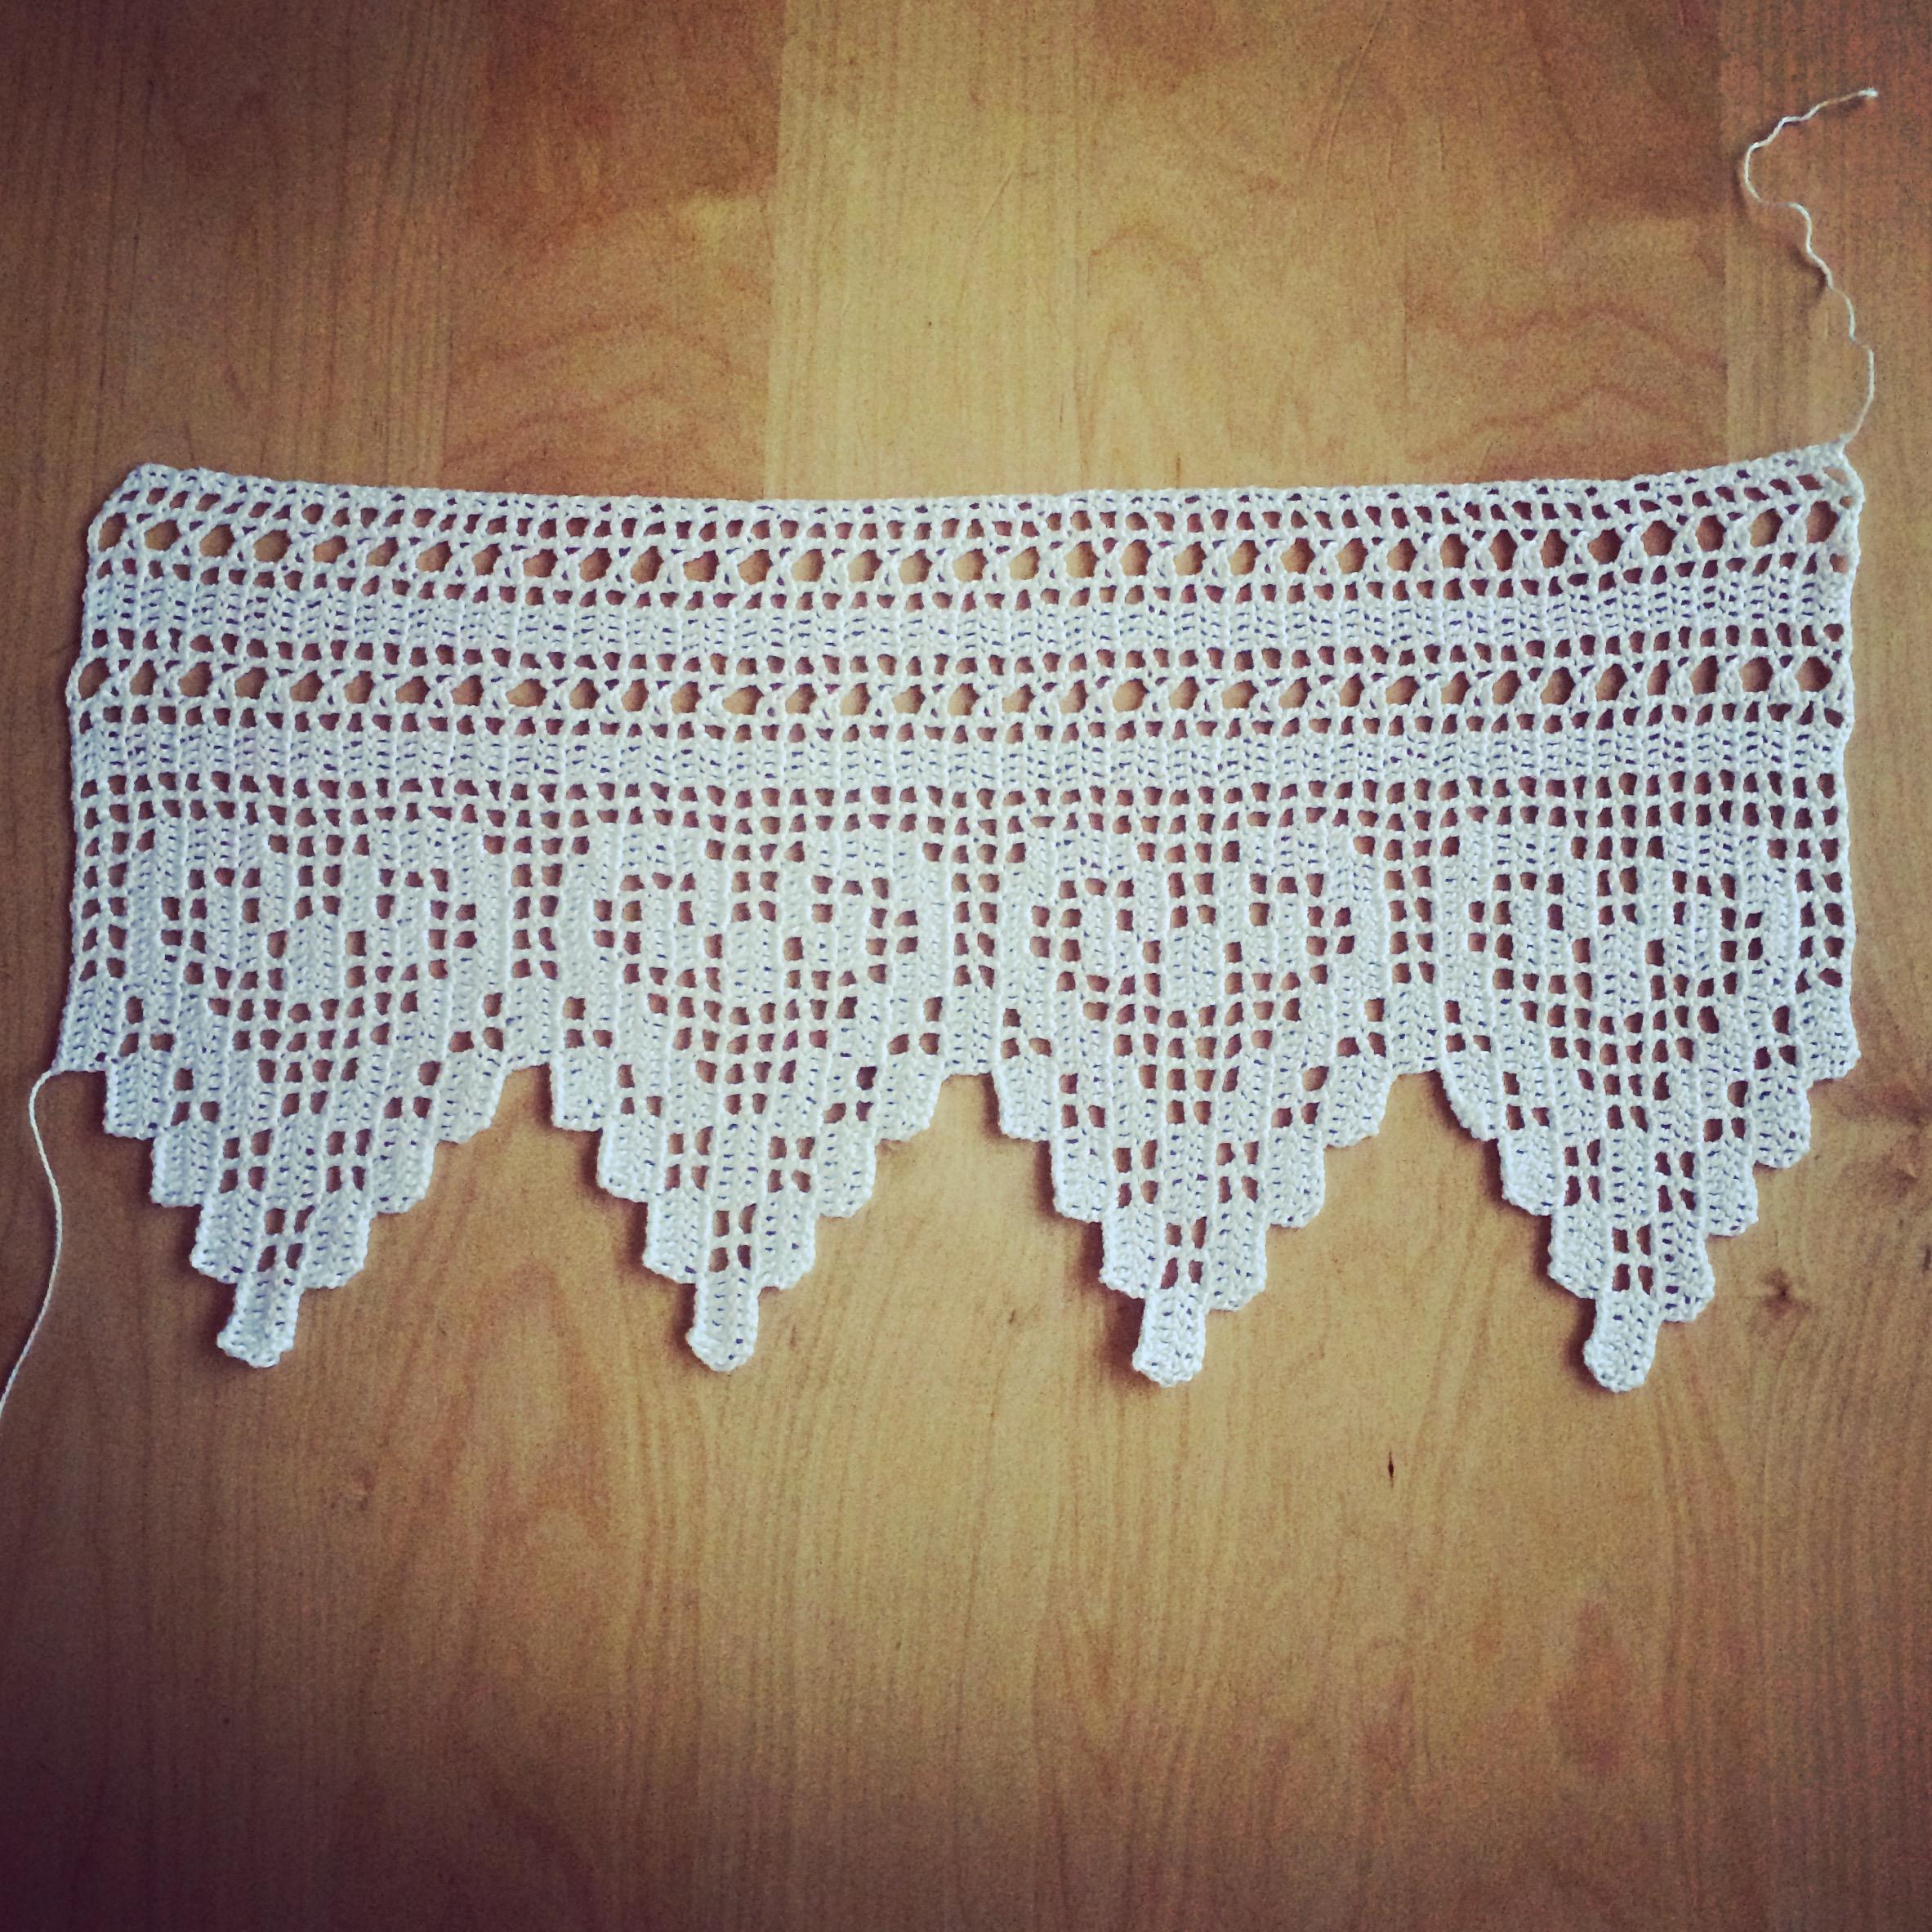 Exceptionnel Brise Bise Motif Coeur   1ère Partie | MyLittleCuteAmis   Amigurumi And  Crochet Blog With Free Patterns